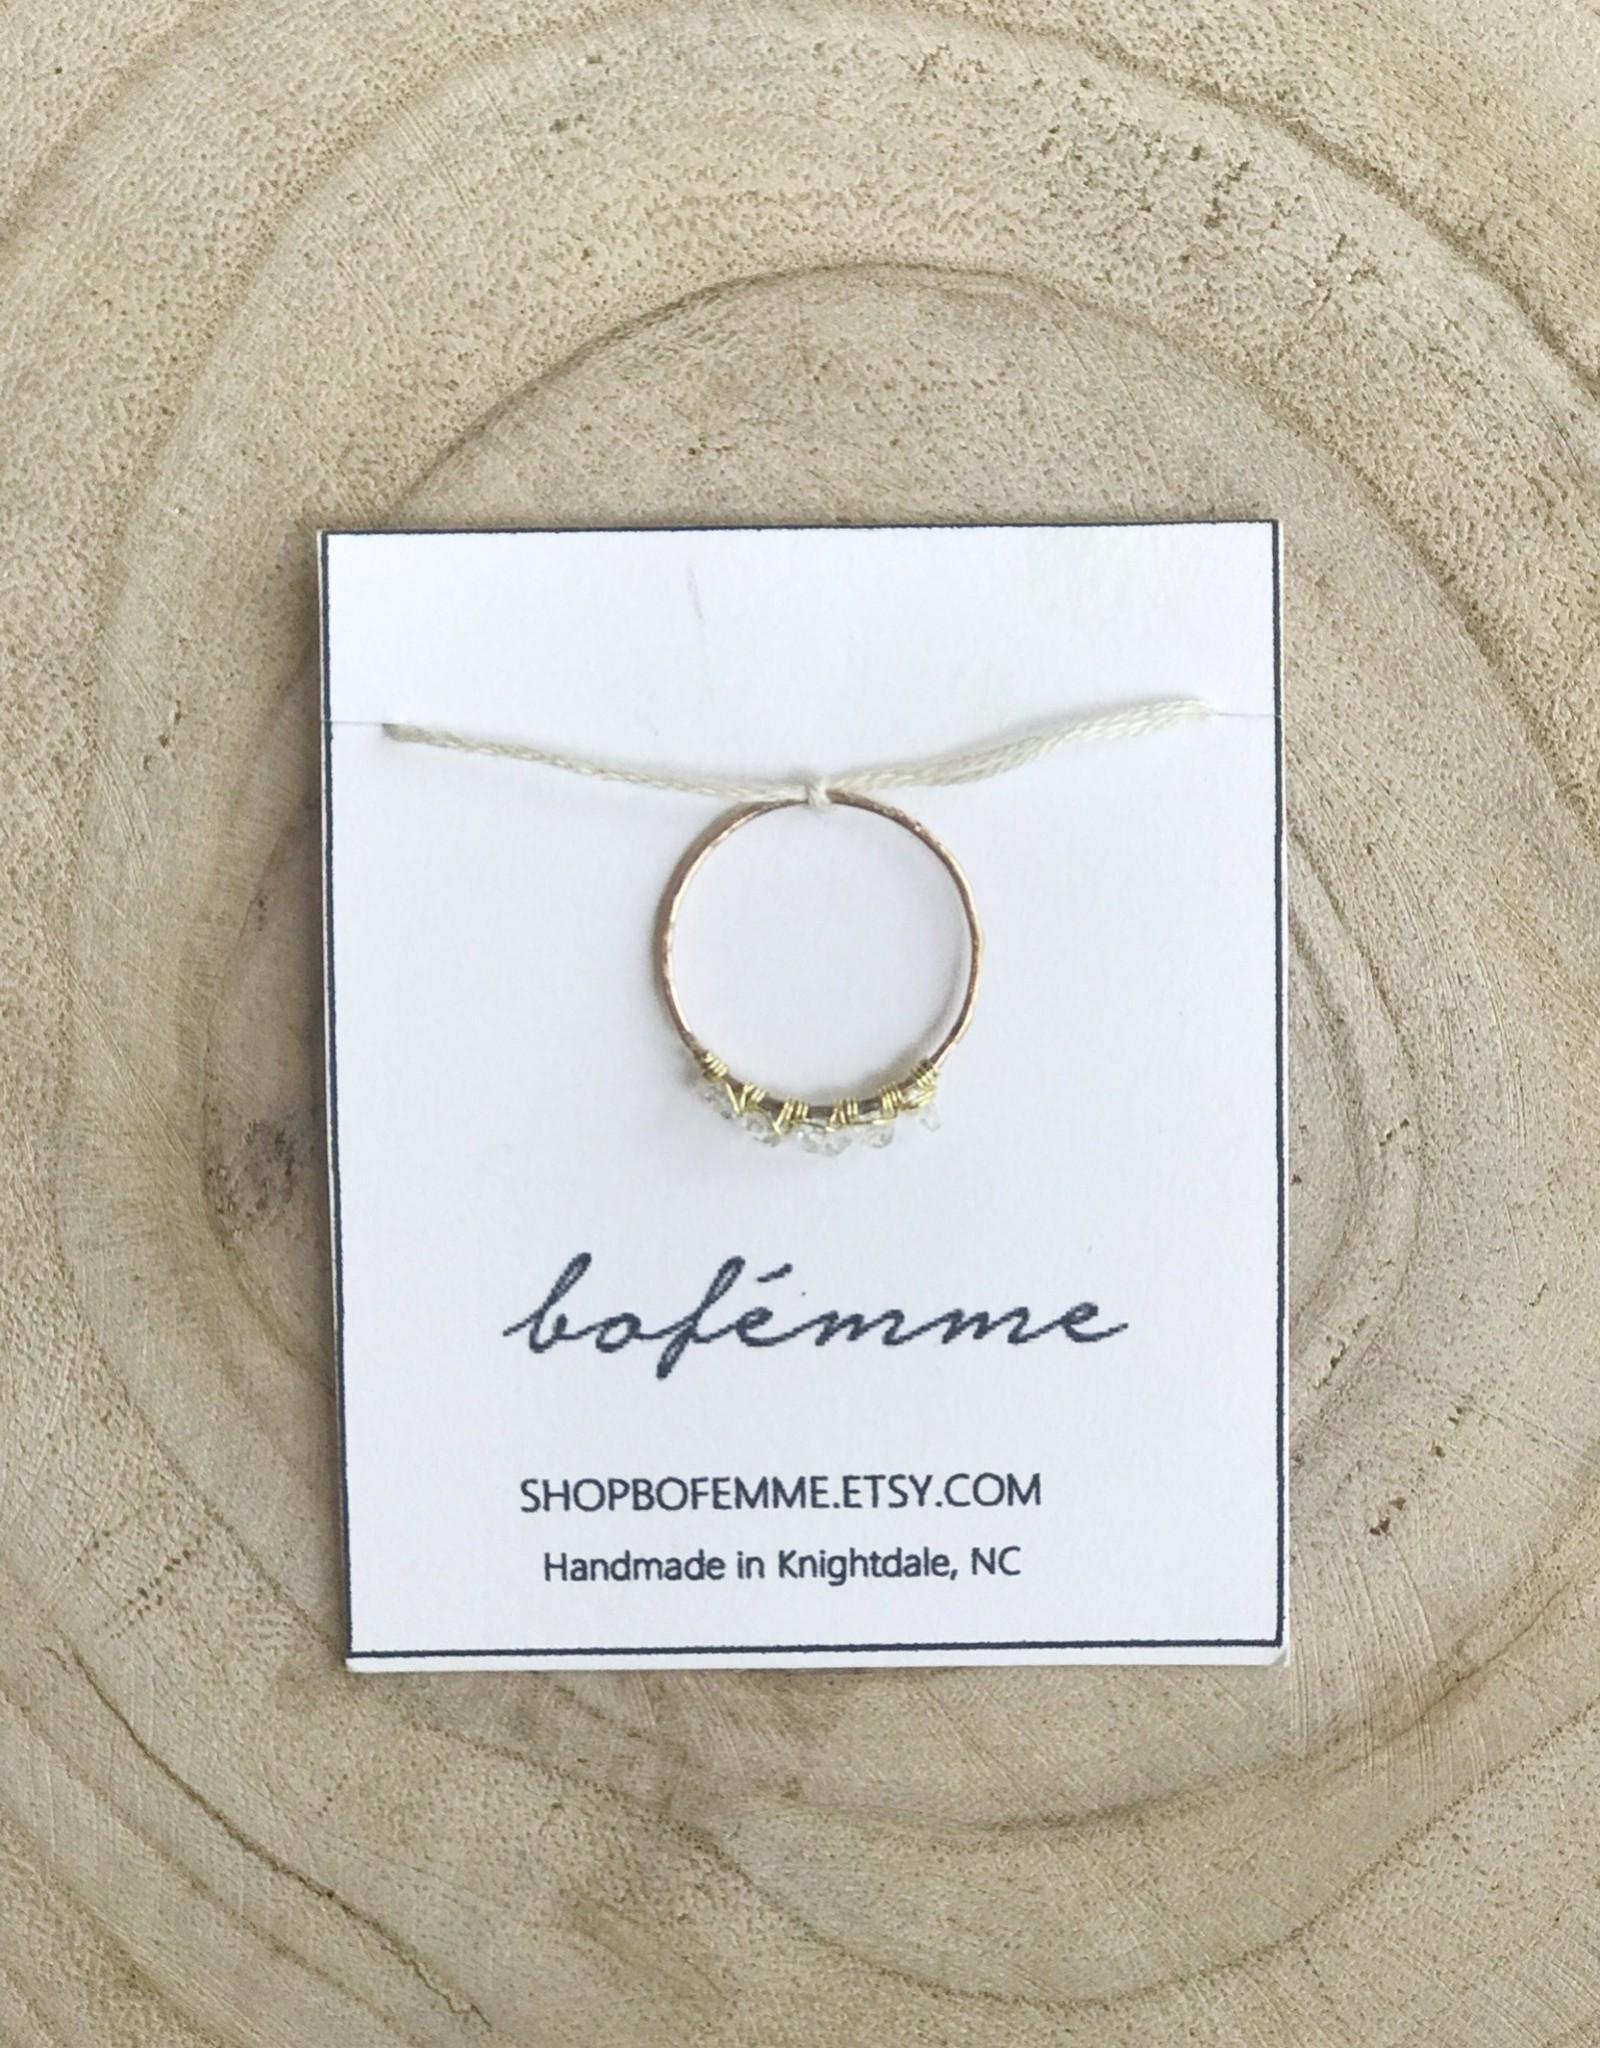 Bofemme Bofemme Raw Herkimer Diamond Ring